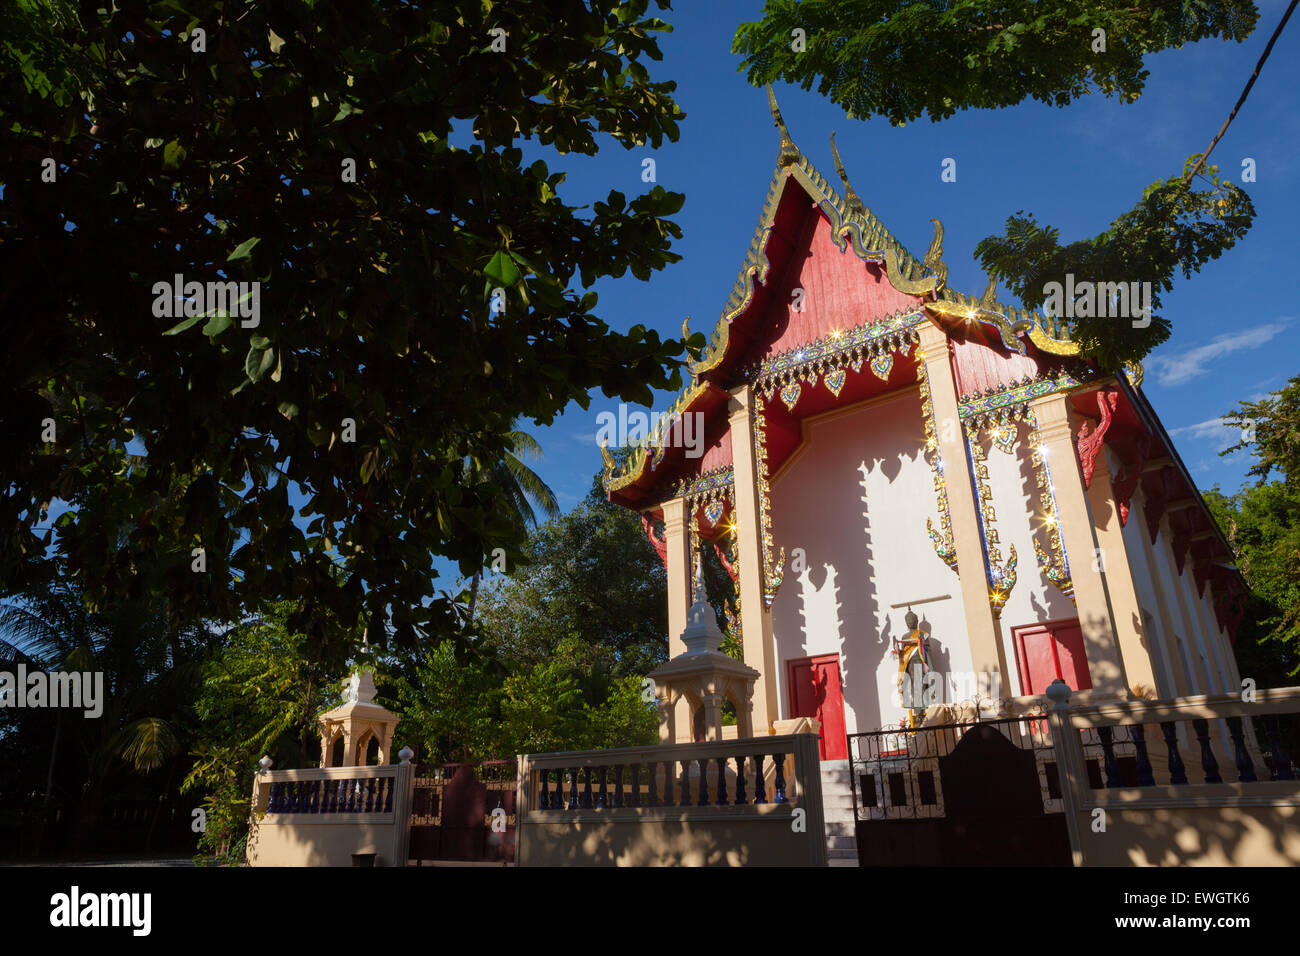 Wat Sema Mueang Tempel in der Provinz Nakhon Si Thammarat, Thailand. Stockfoto